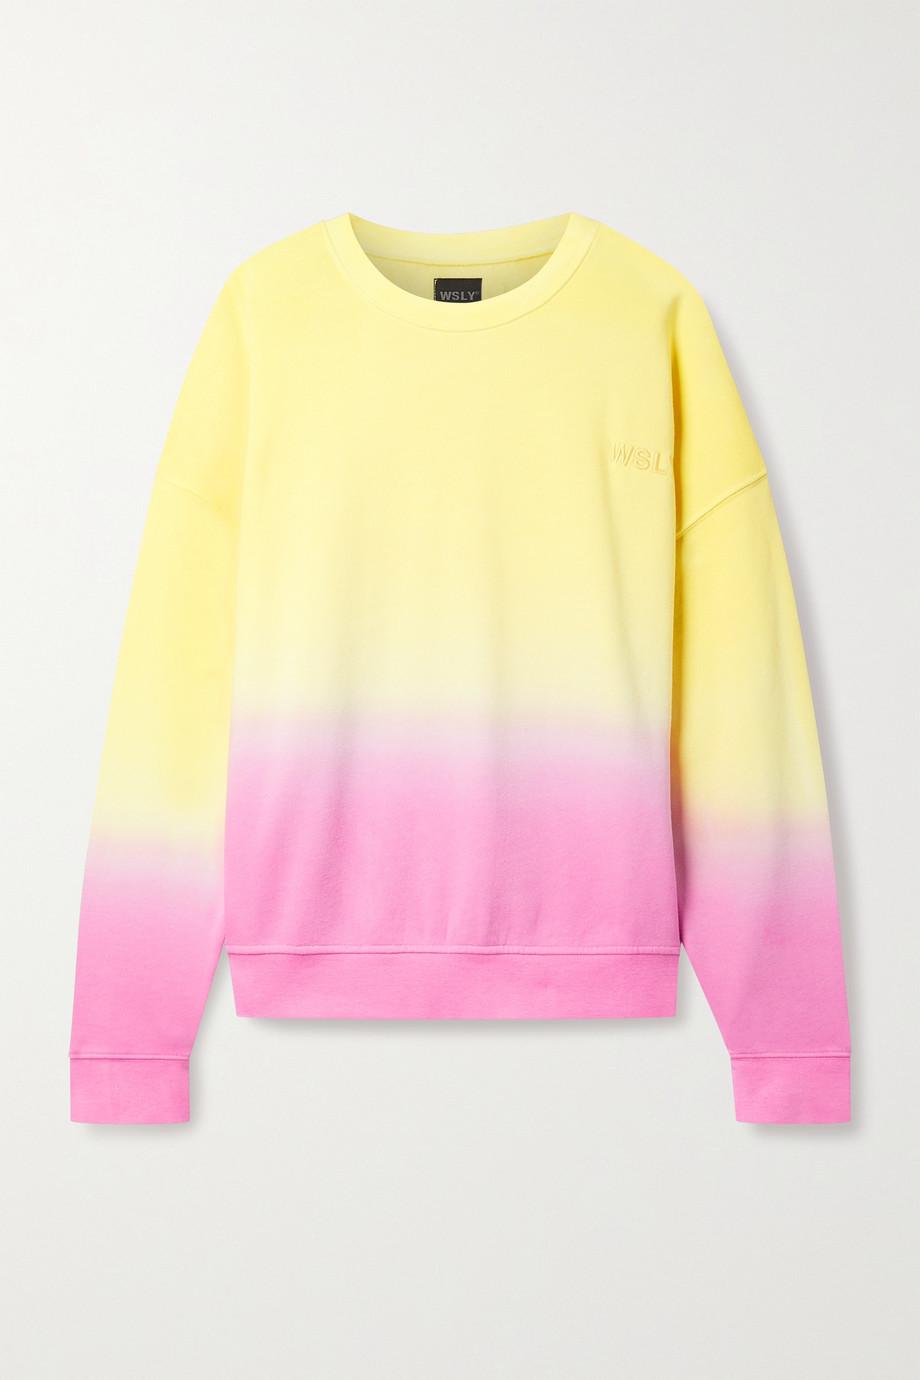 WSLY Ombré cotton-blend jersey sweatshirt